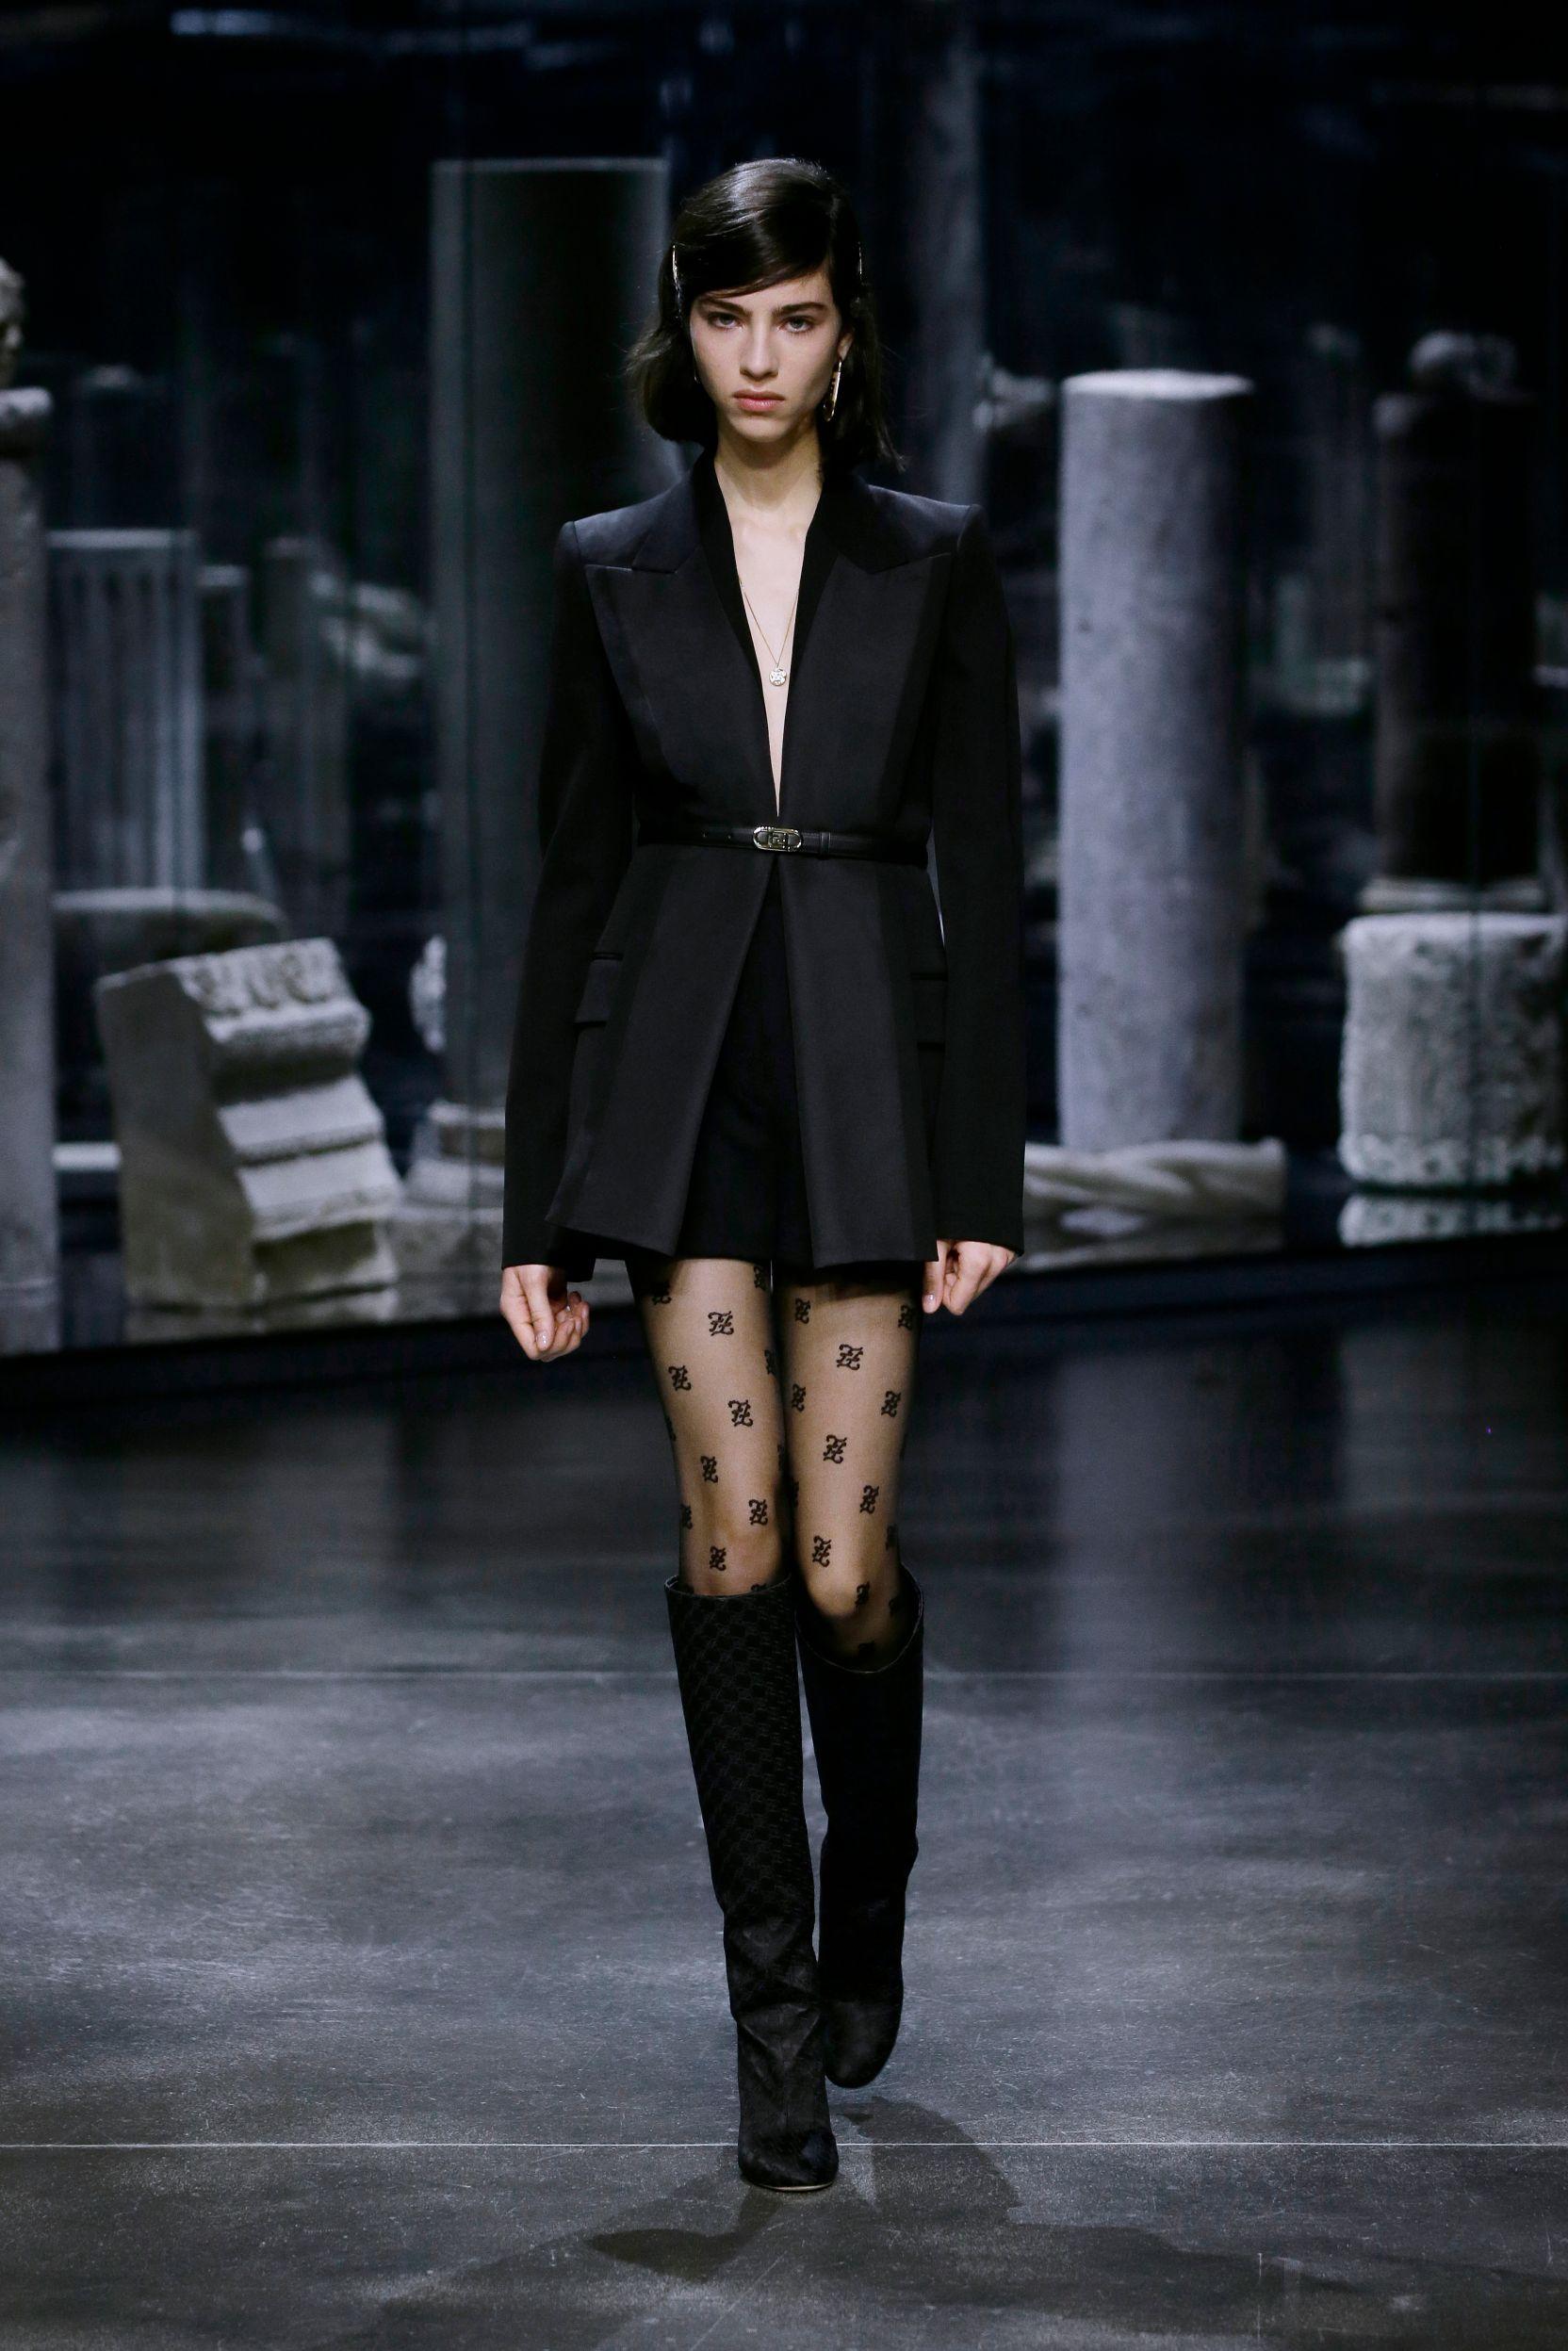 milan-fashion-week--fendi-autumn-winter-2022-collection-54_FENDI_WOMEN_FW_21_22.jpg